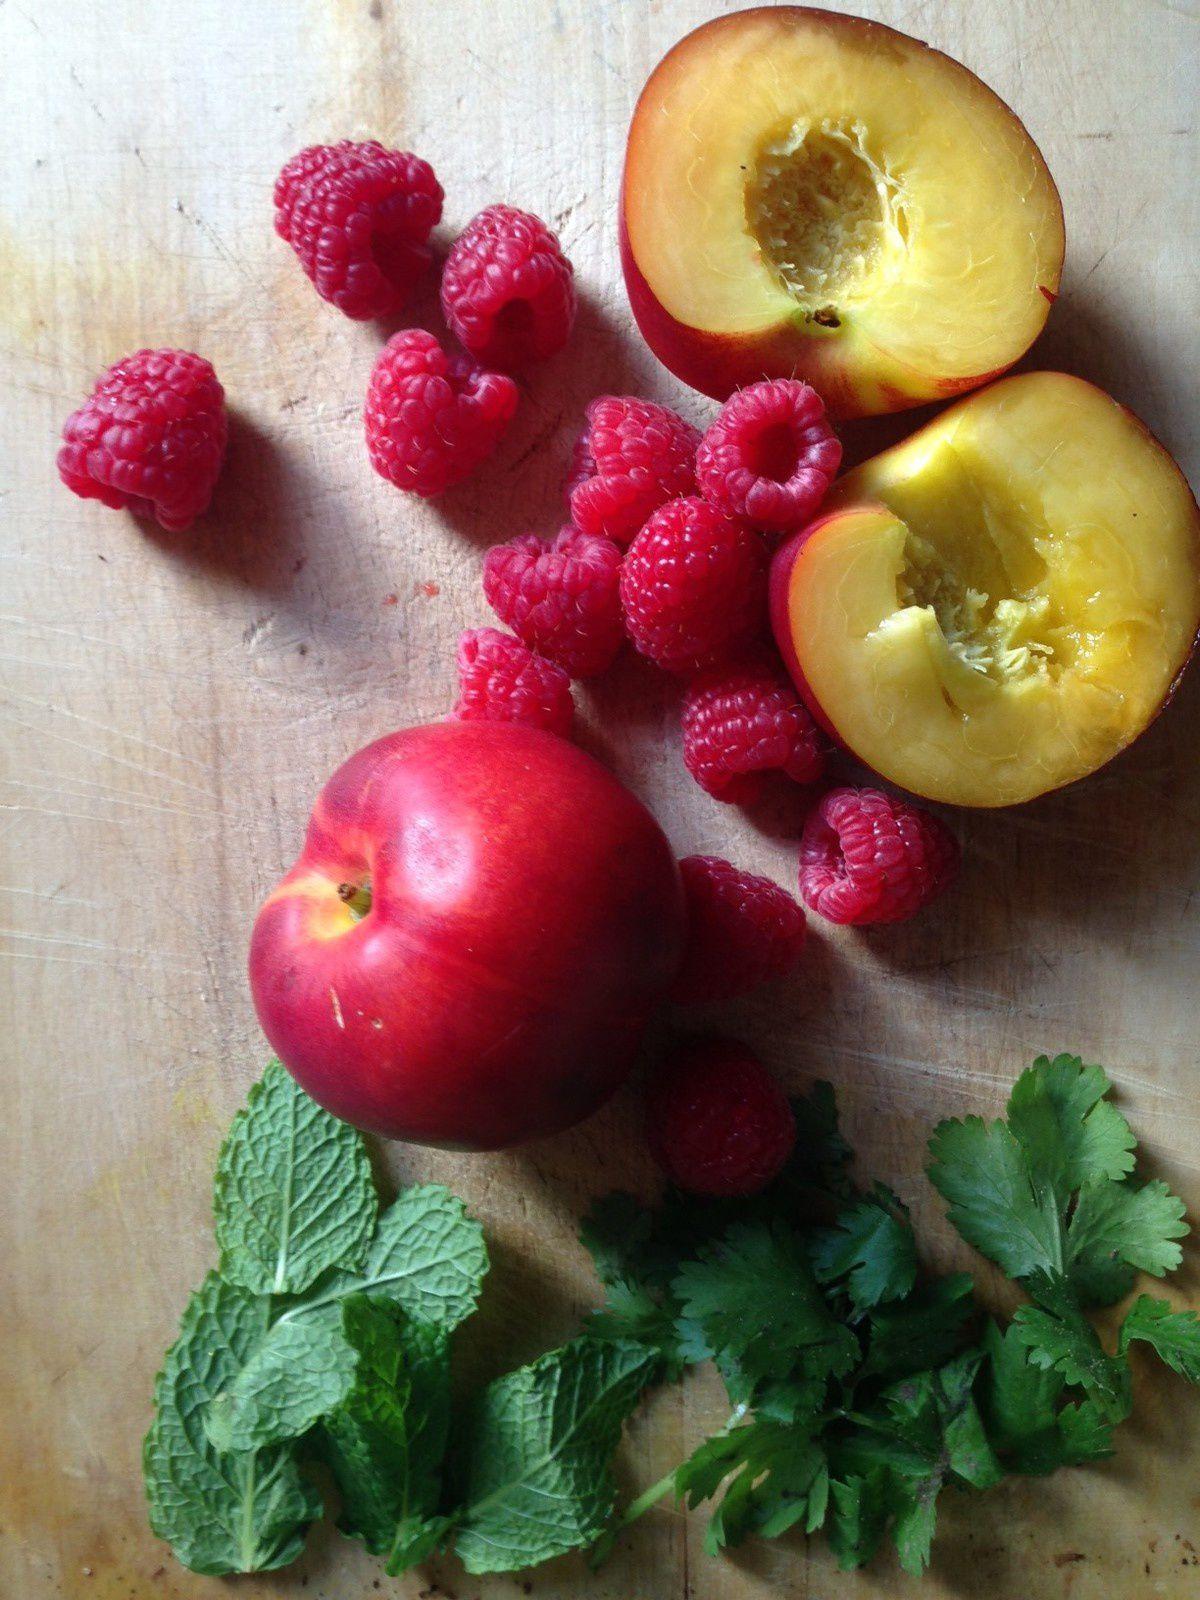 Salade de fruits d'été fraich'attitude